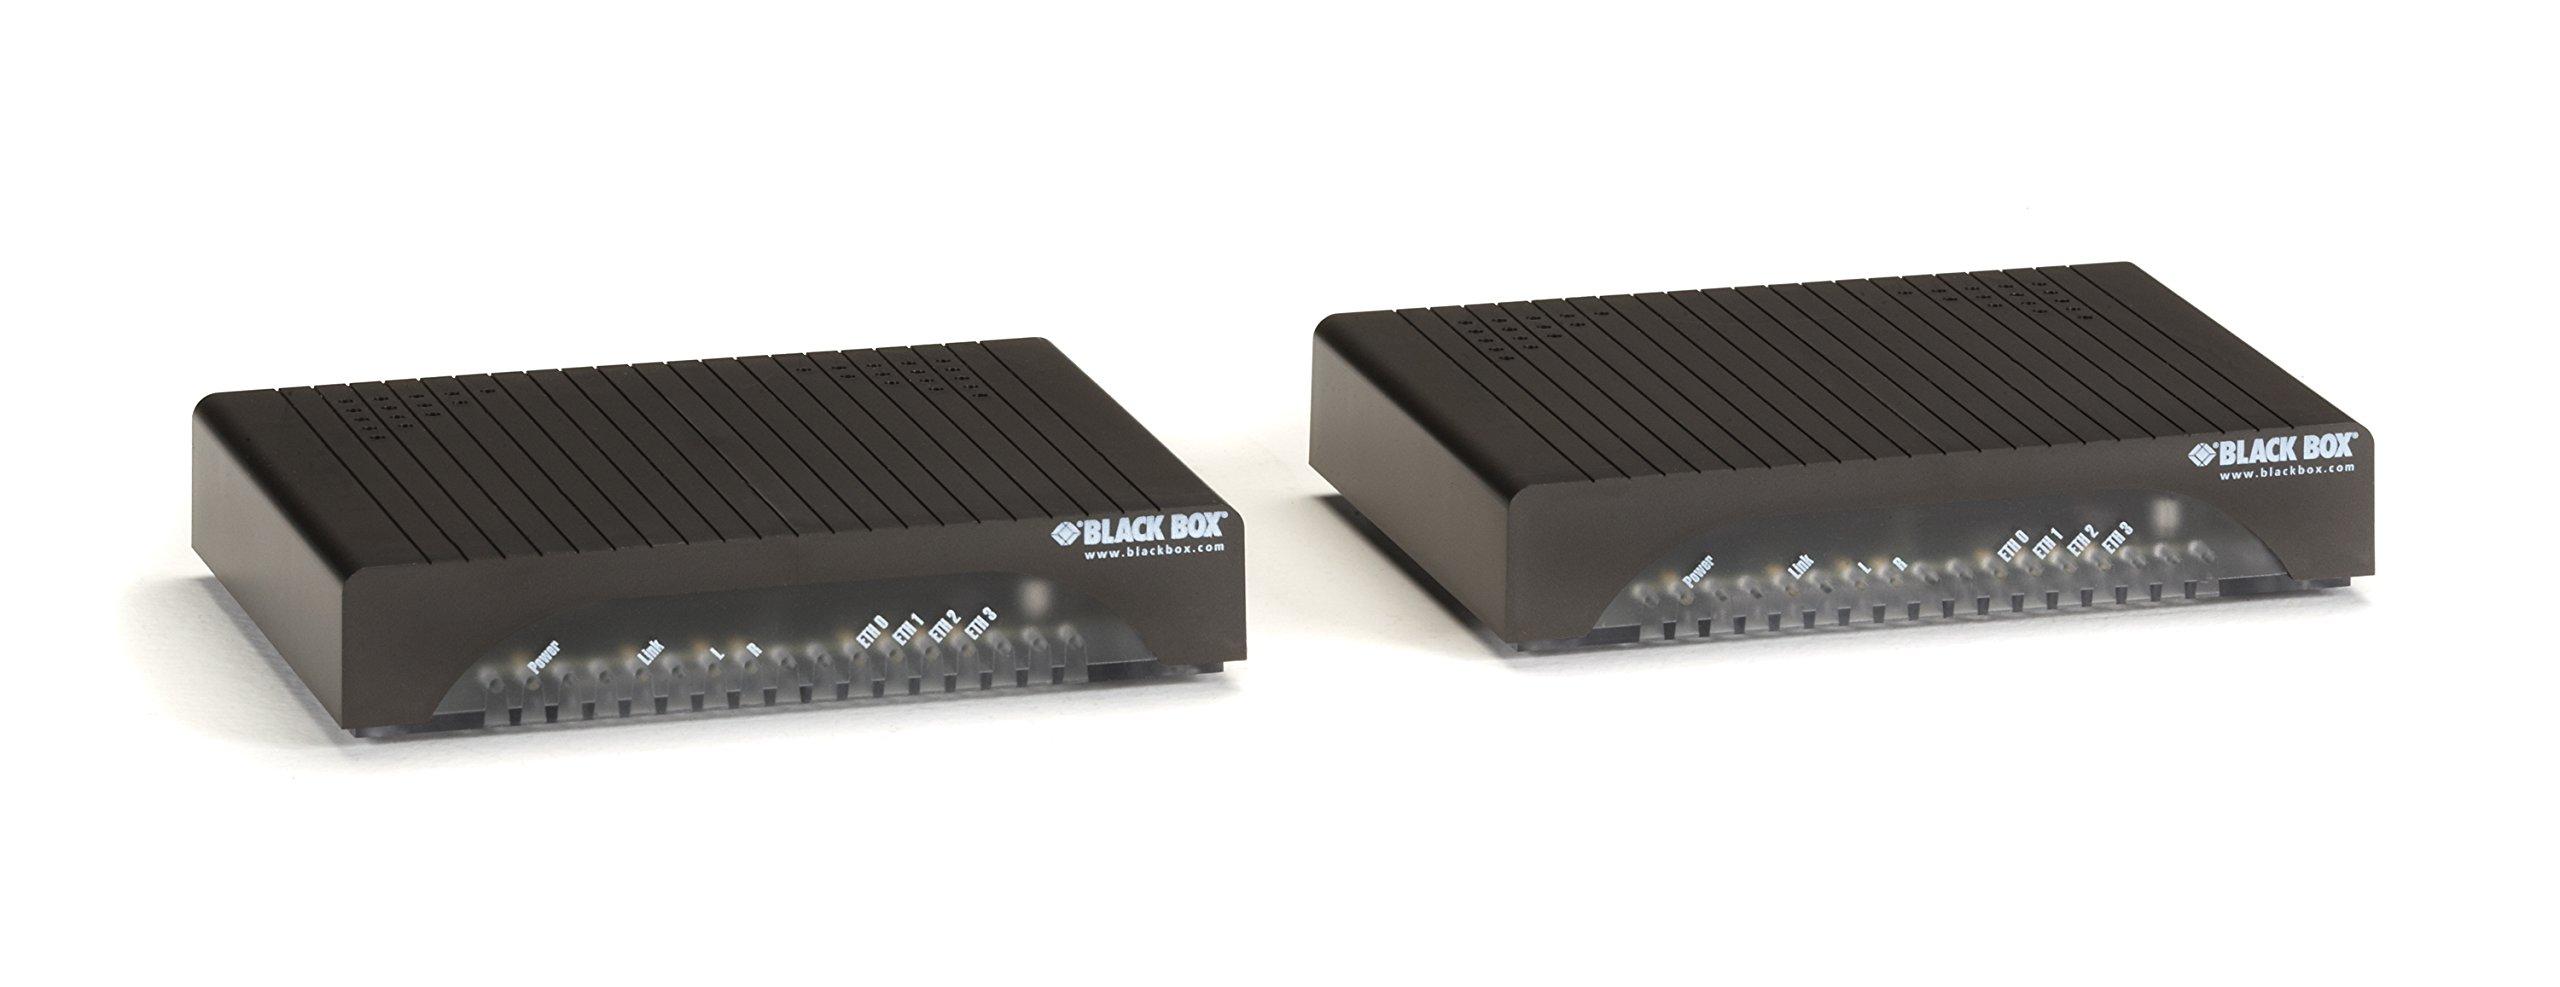 Black Box 8-Port 10BASE-T/100BASE-TX Hardened Ethernet Extender Switch